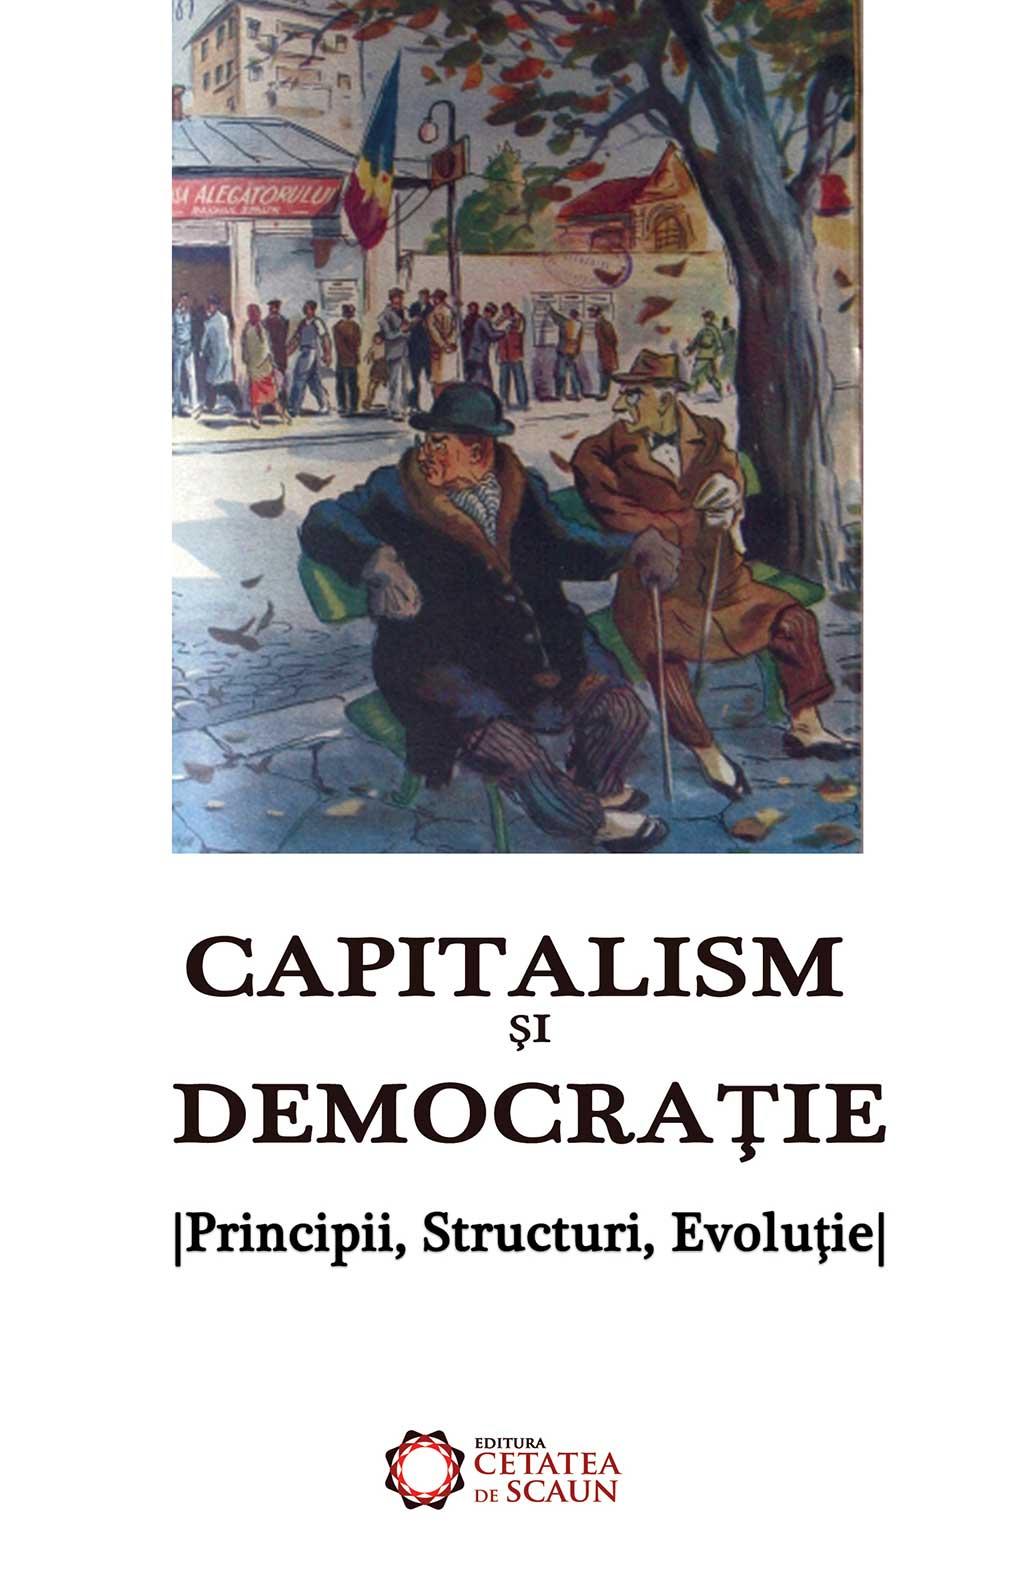 Capitalism si democratie. Principii, structuri, evolutie